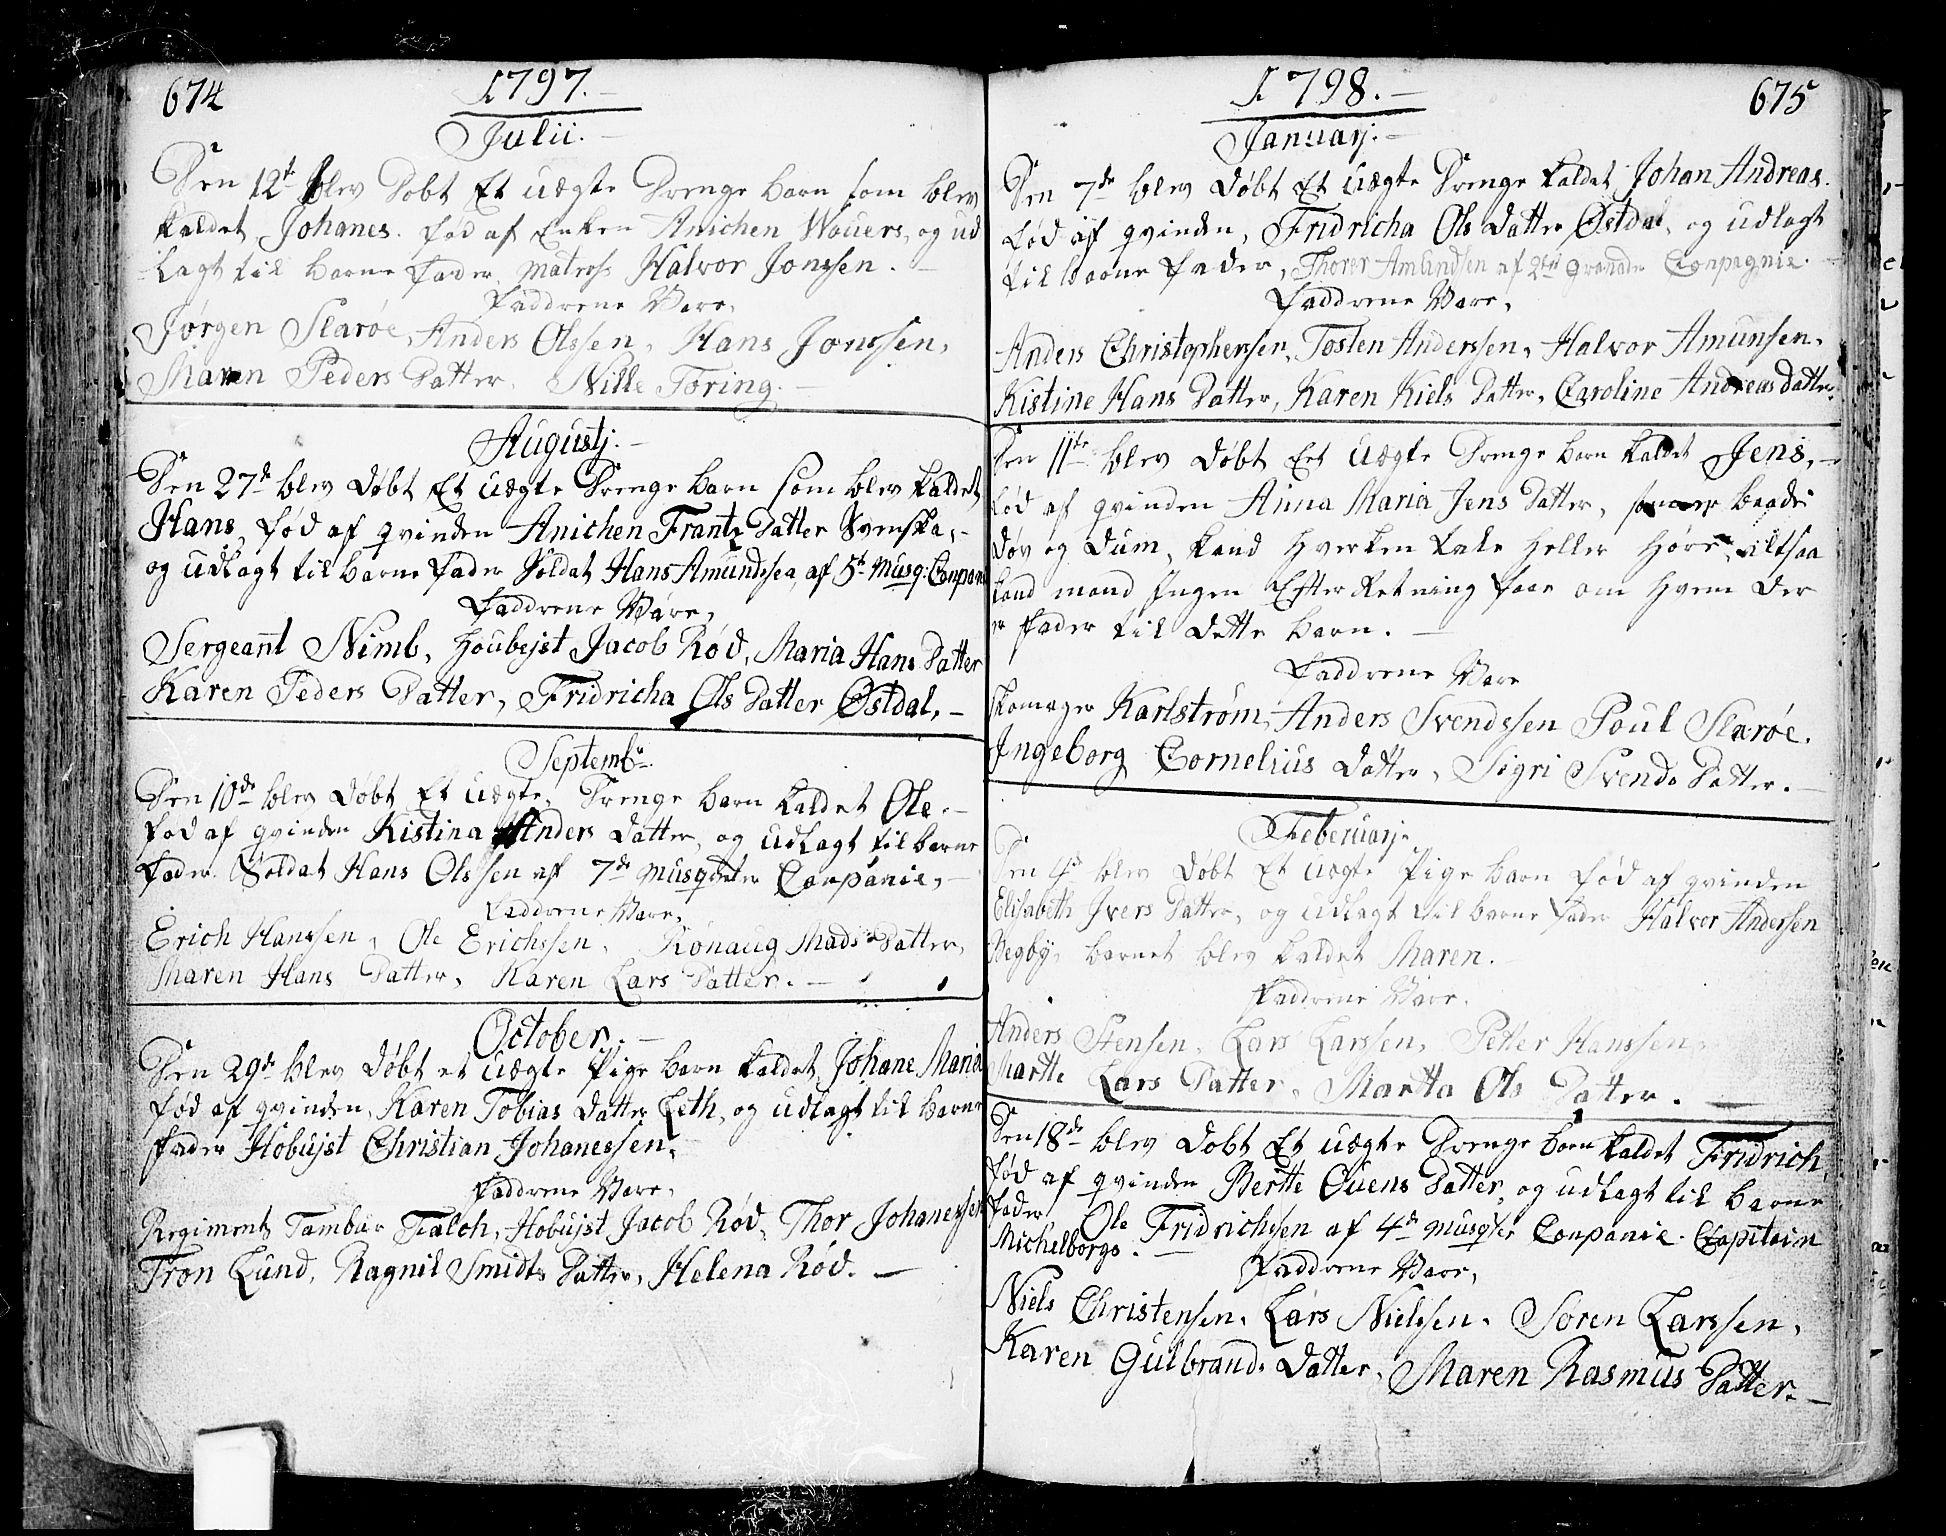 SAO, Fredrikstad prestekontor Kirkebøker, F/Fa/L0002: Ministerialbok nr. 2, 1750-1804, s. 674-675